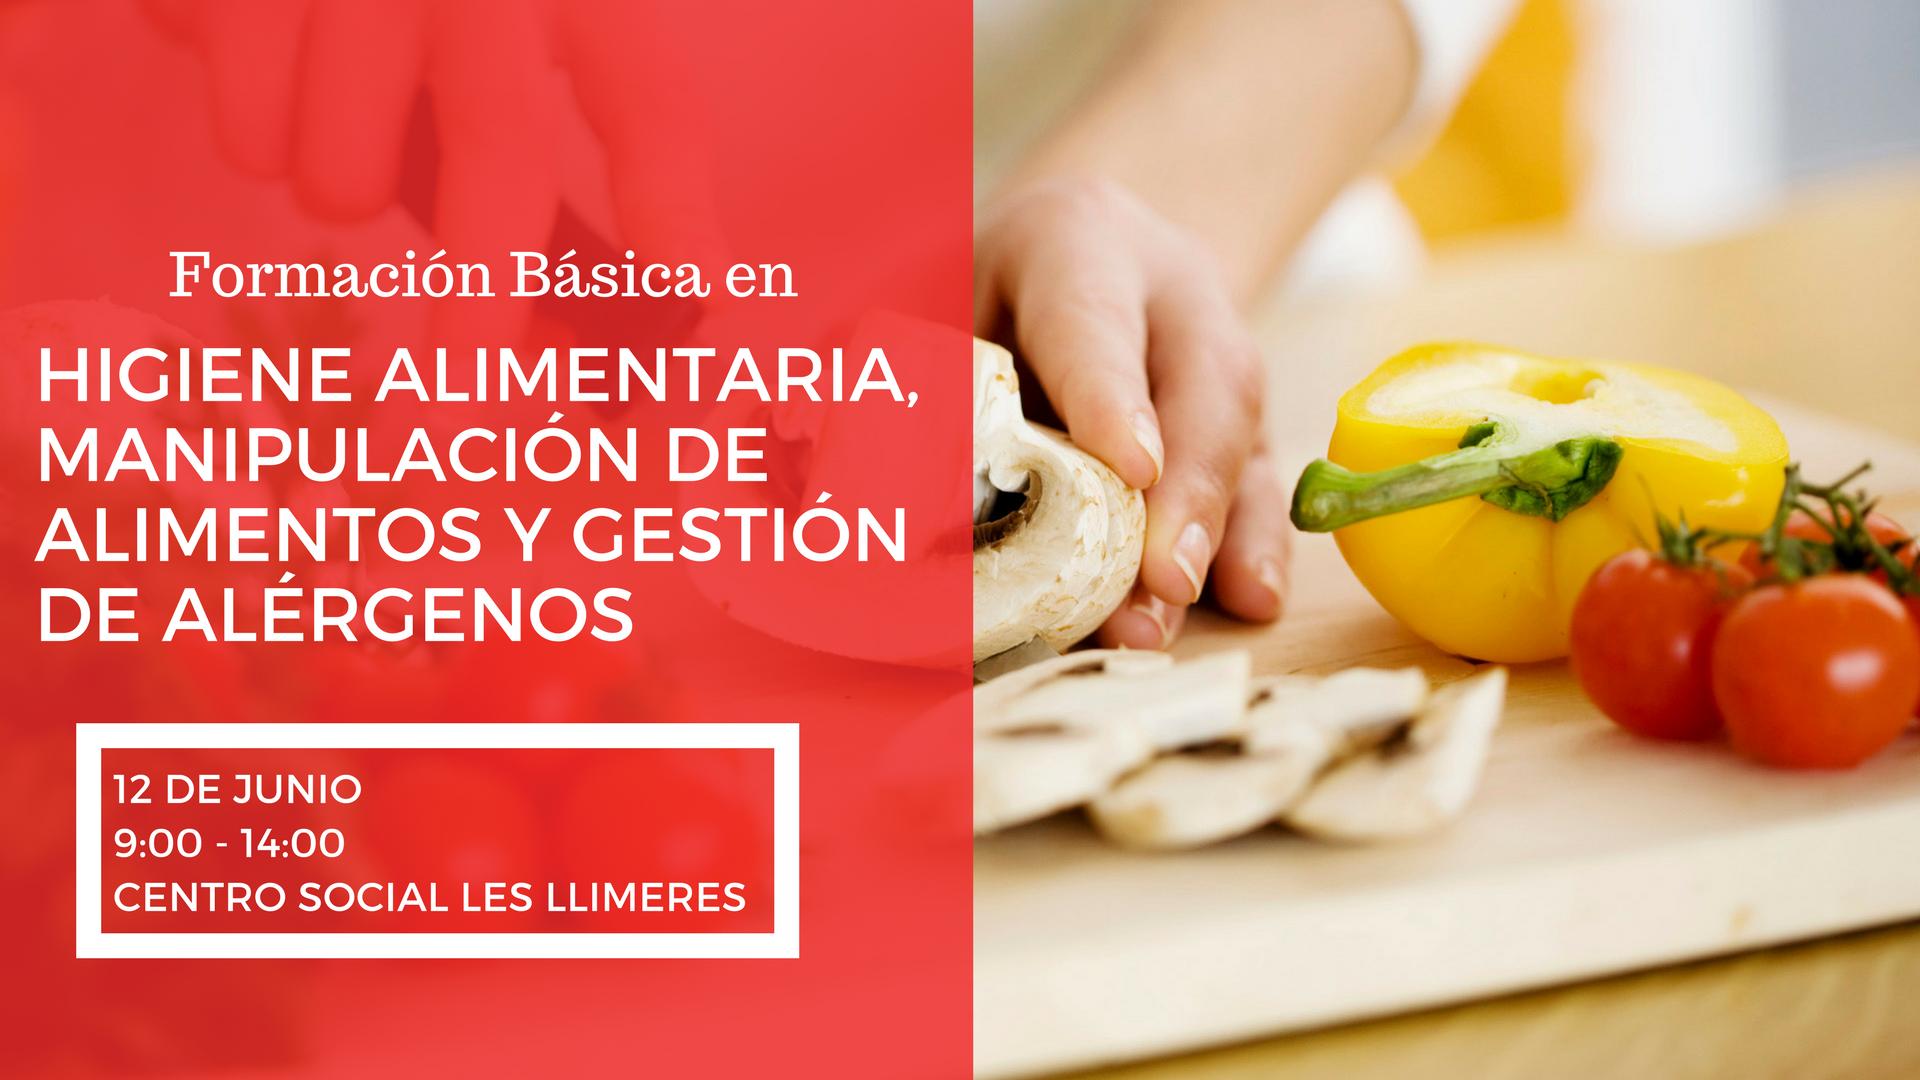 Curso 2017 formaci n b sica en higiene alimentaria manipulaci n de alimentos y gesti n de - Higiene alimentaria y manipulacion de alimentos ...